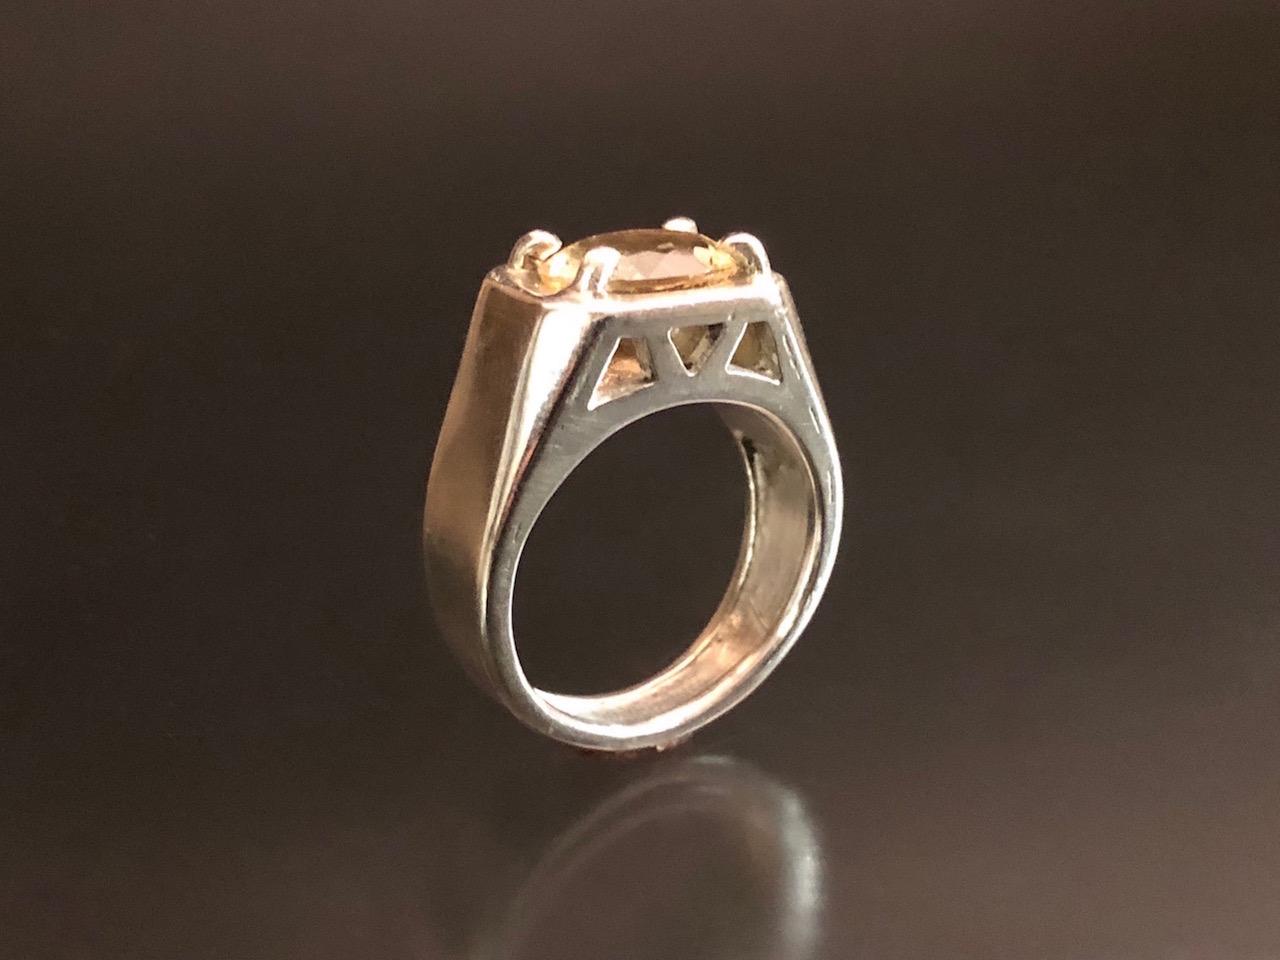 Handmade Silver Ring and Citrine copy.jpg